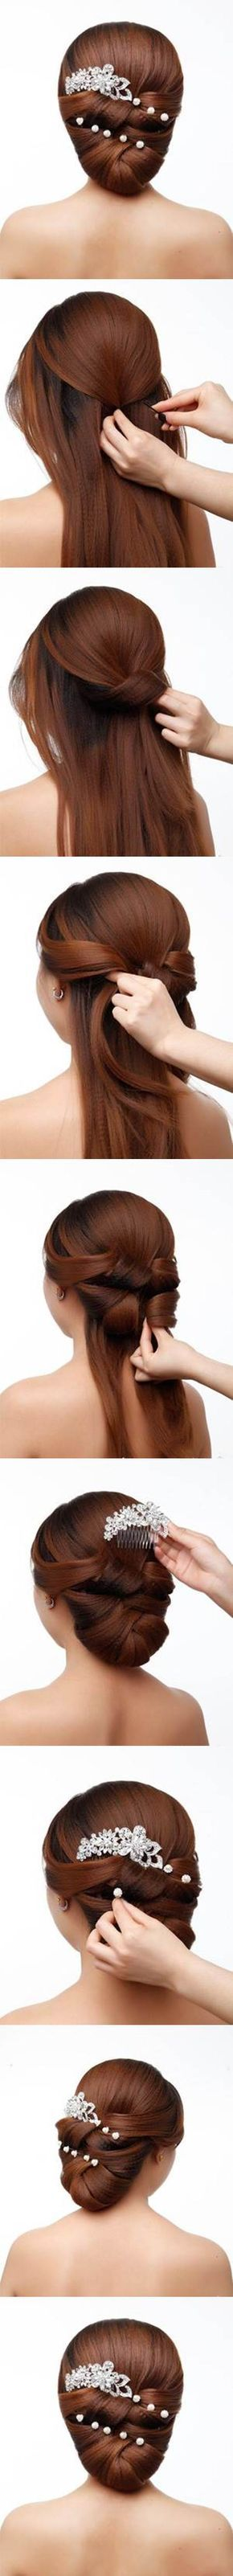 DIY Elegant Bridal Hairstyle | iCreativeIdeas.com Like Us on Facebook ==> https://www.facebook.com/icreativeideas